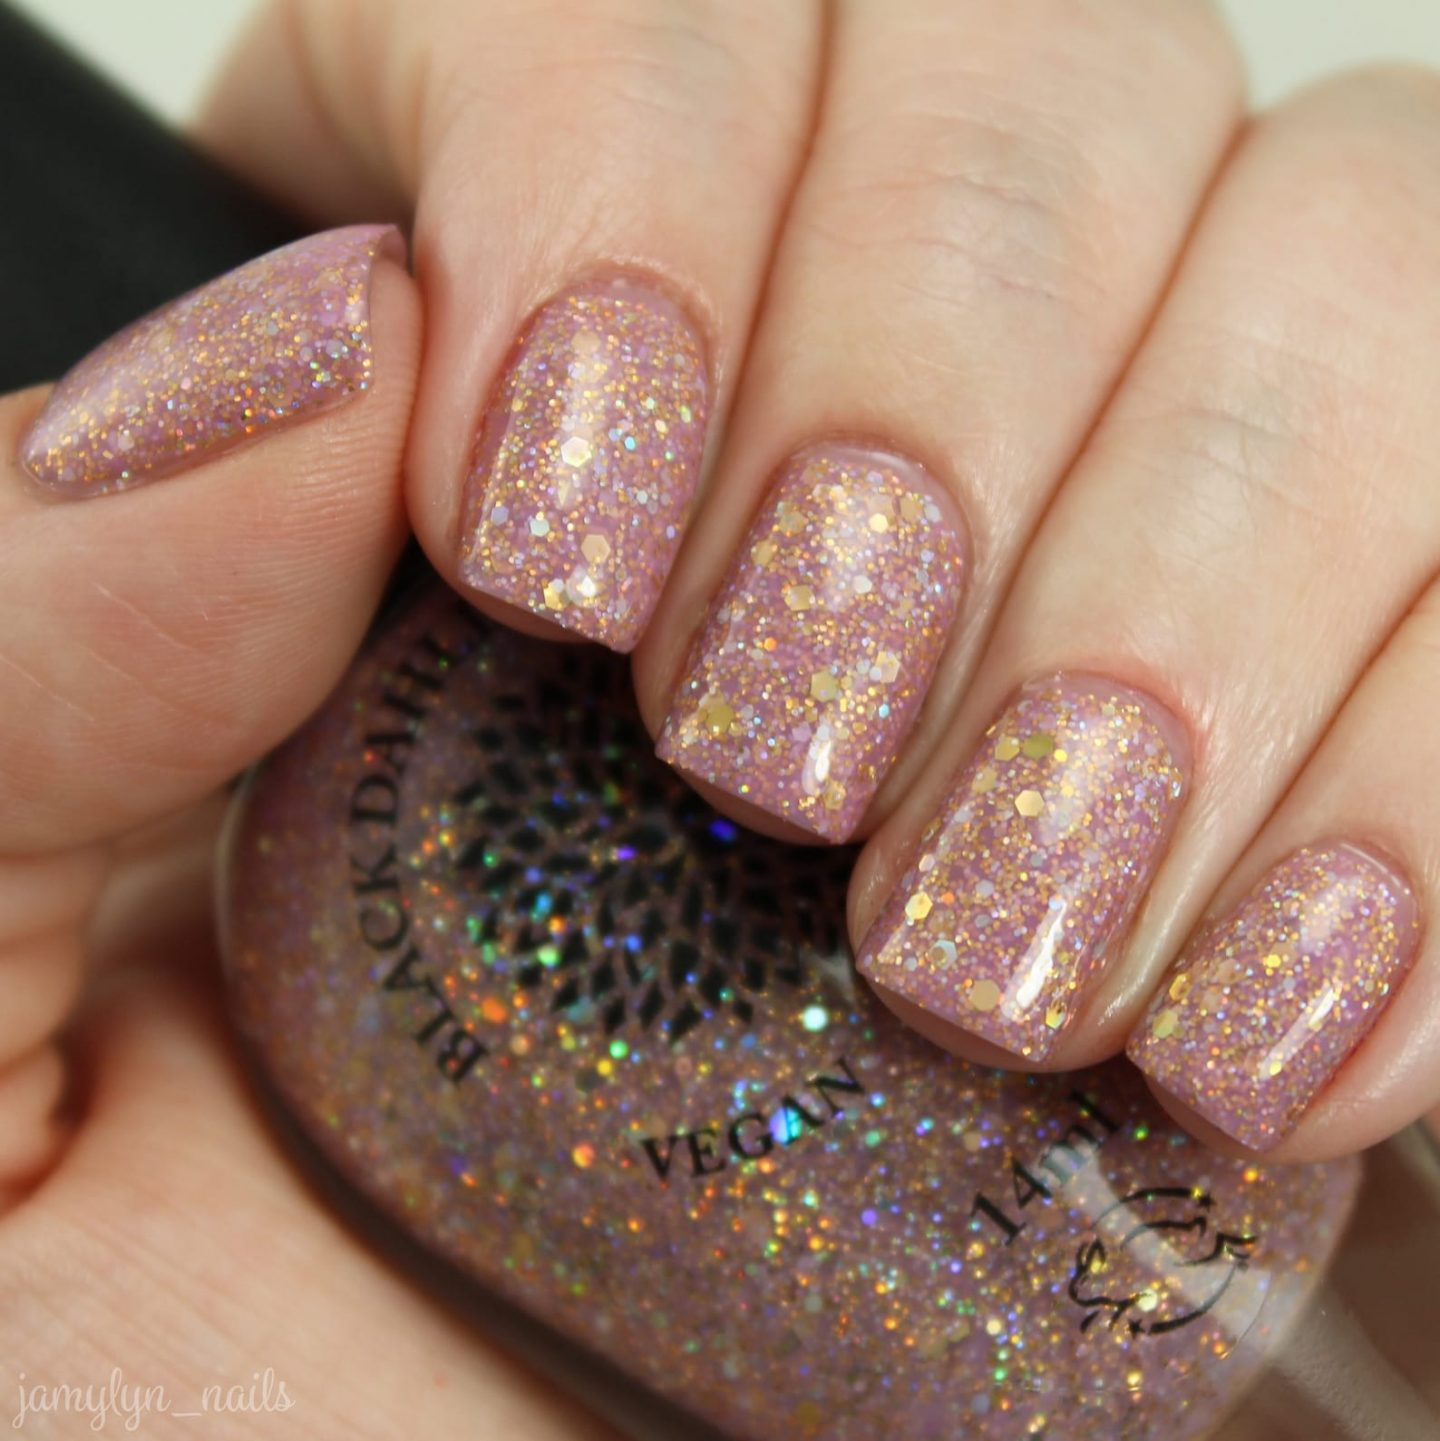 Cute short rose gold nail polish with glitter